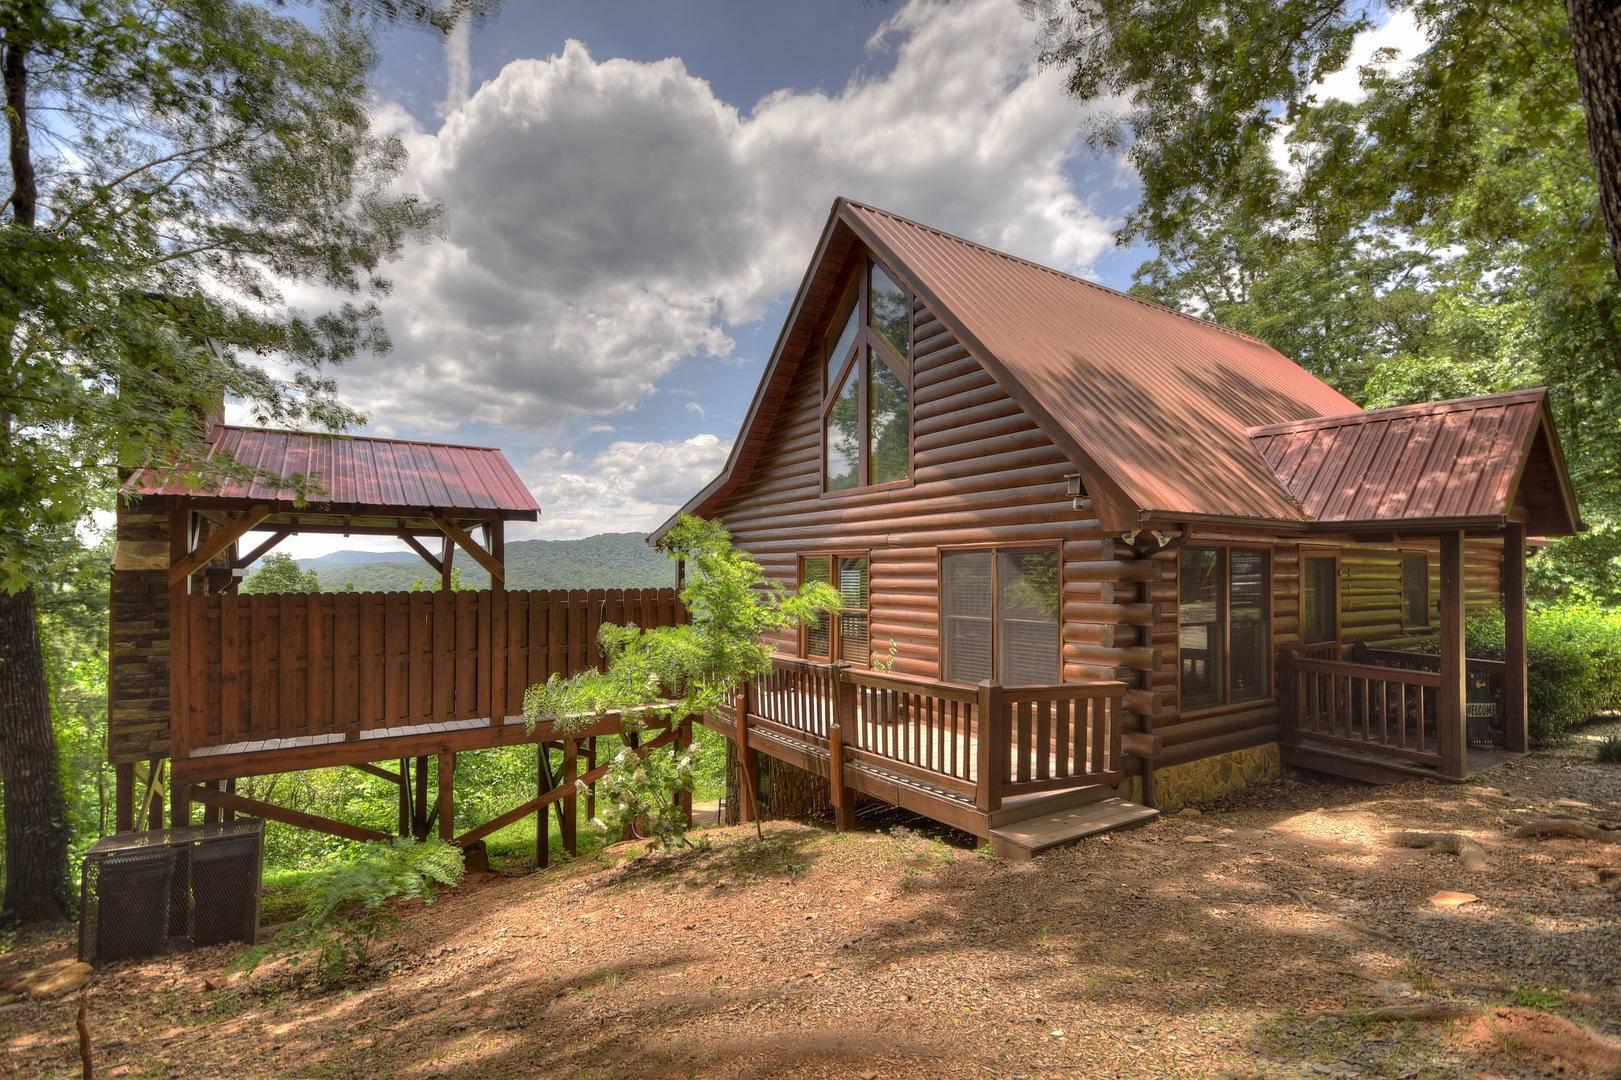 Georgia Cabins A Sunset Ridge Morning Breeze Cabin Rentals